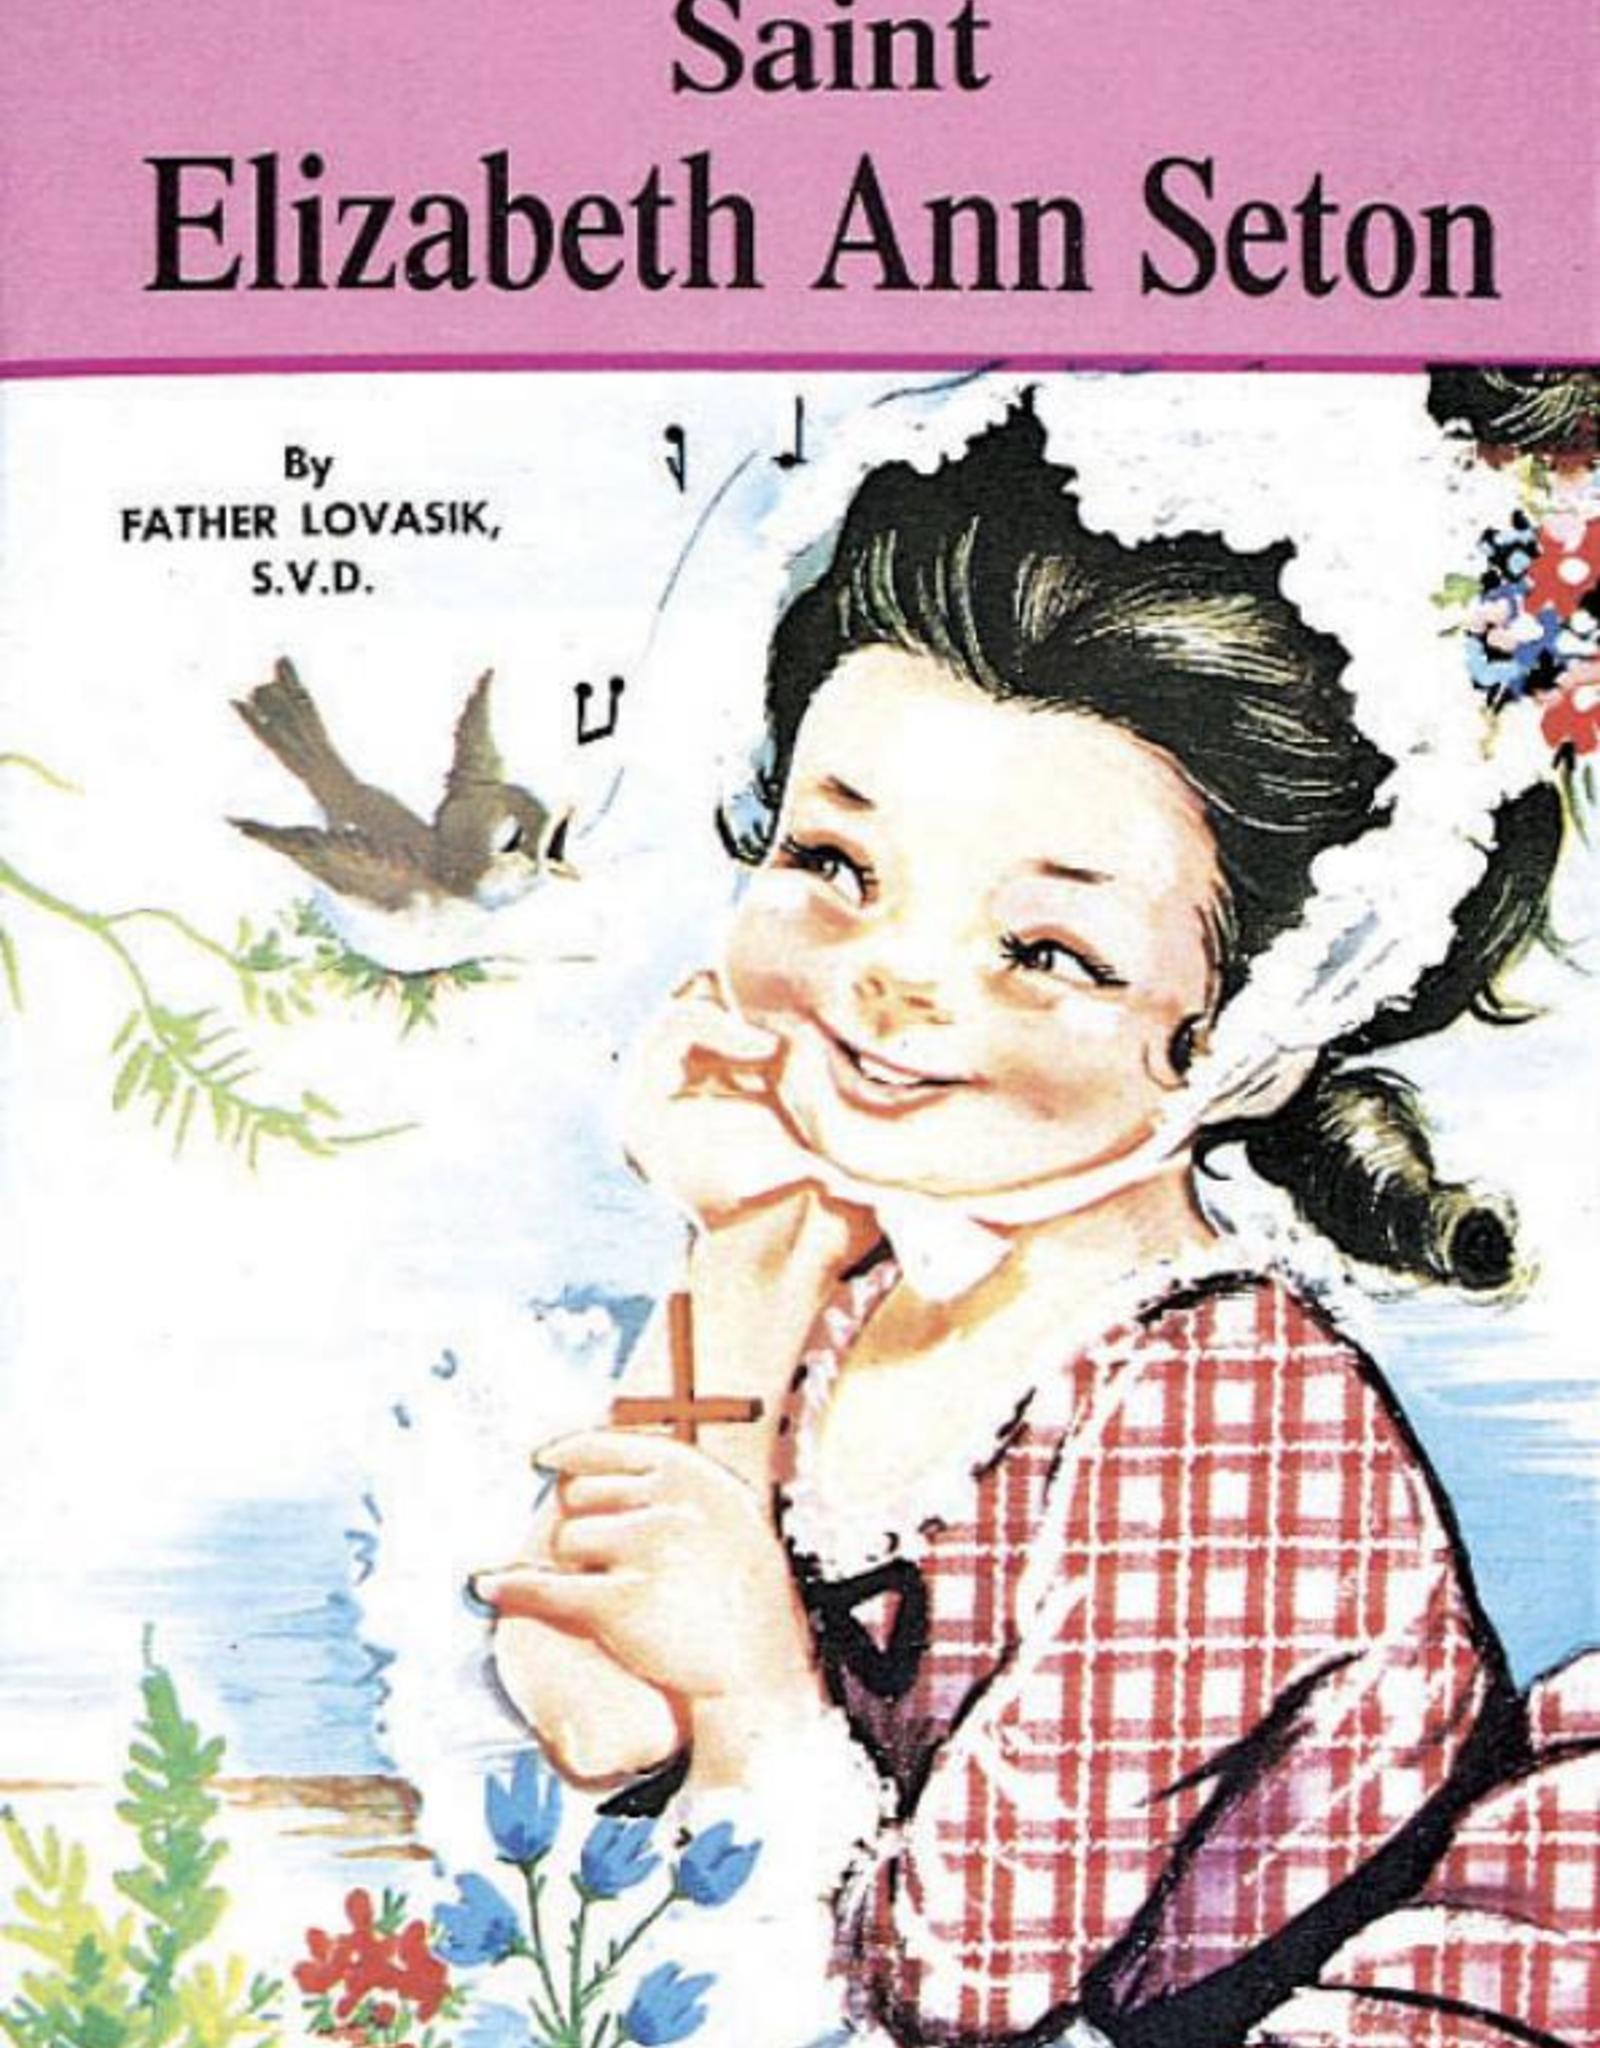 Catholic Book Publishing Saint Elizabeth Ann Seton, by Rev. Lawrence Lovasik